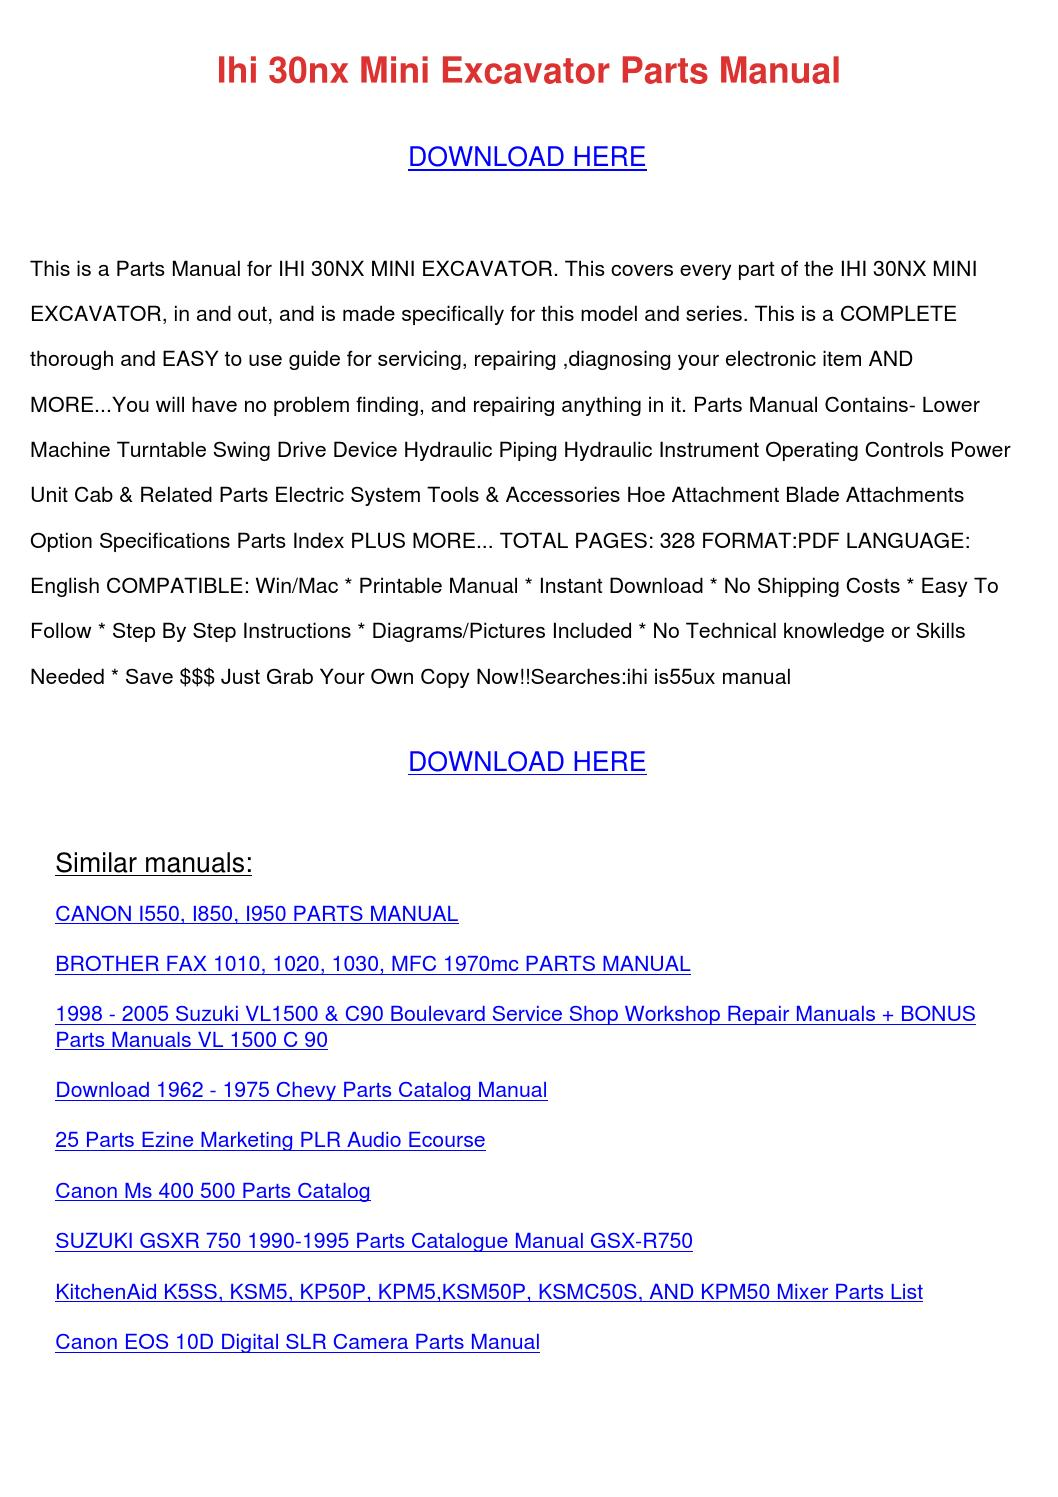 Ihi 30nx Mini Excavator Parts Manual by KlausJean - issuu